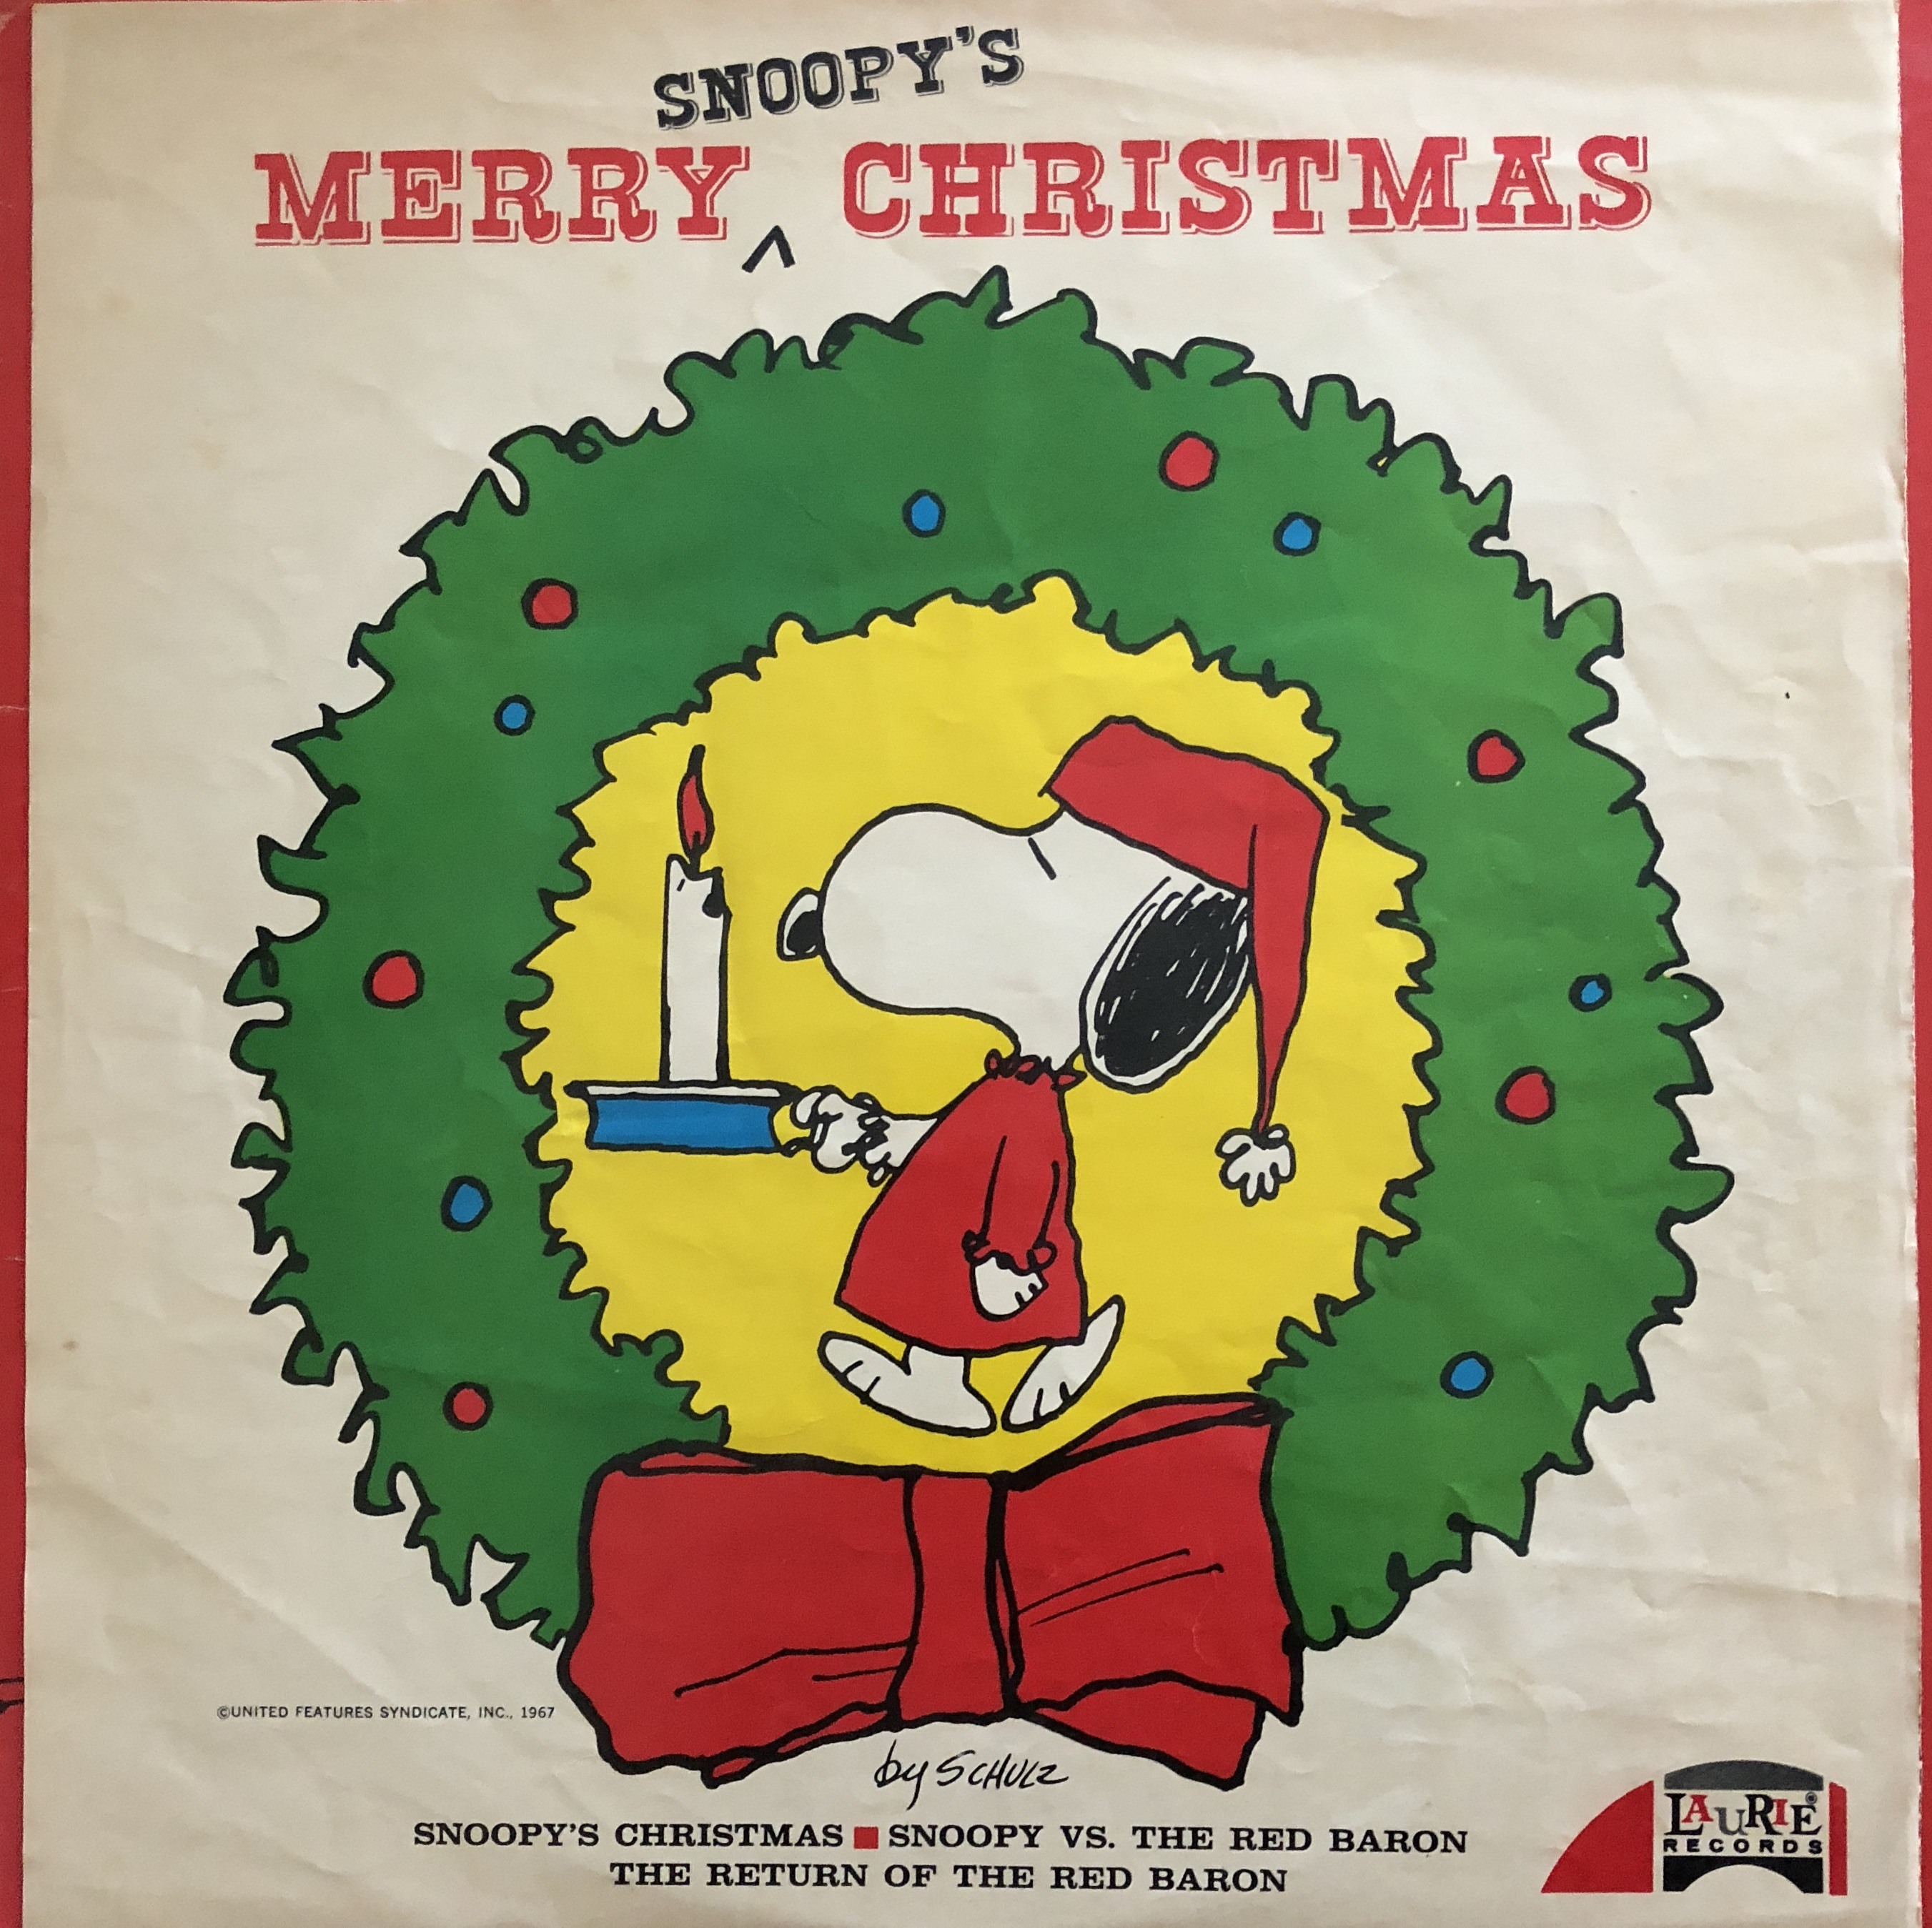 SnoopyChristmas